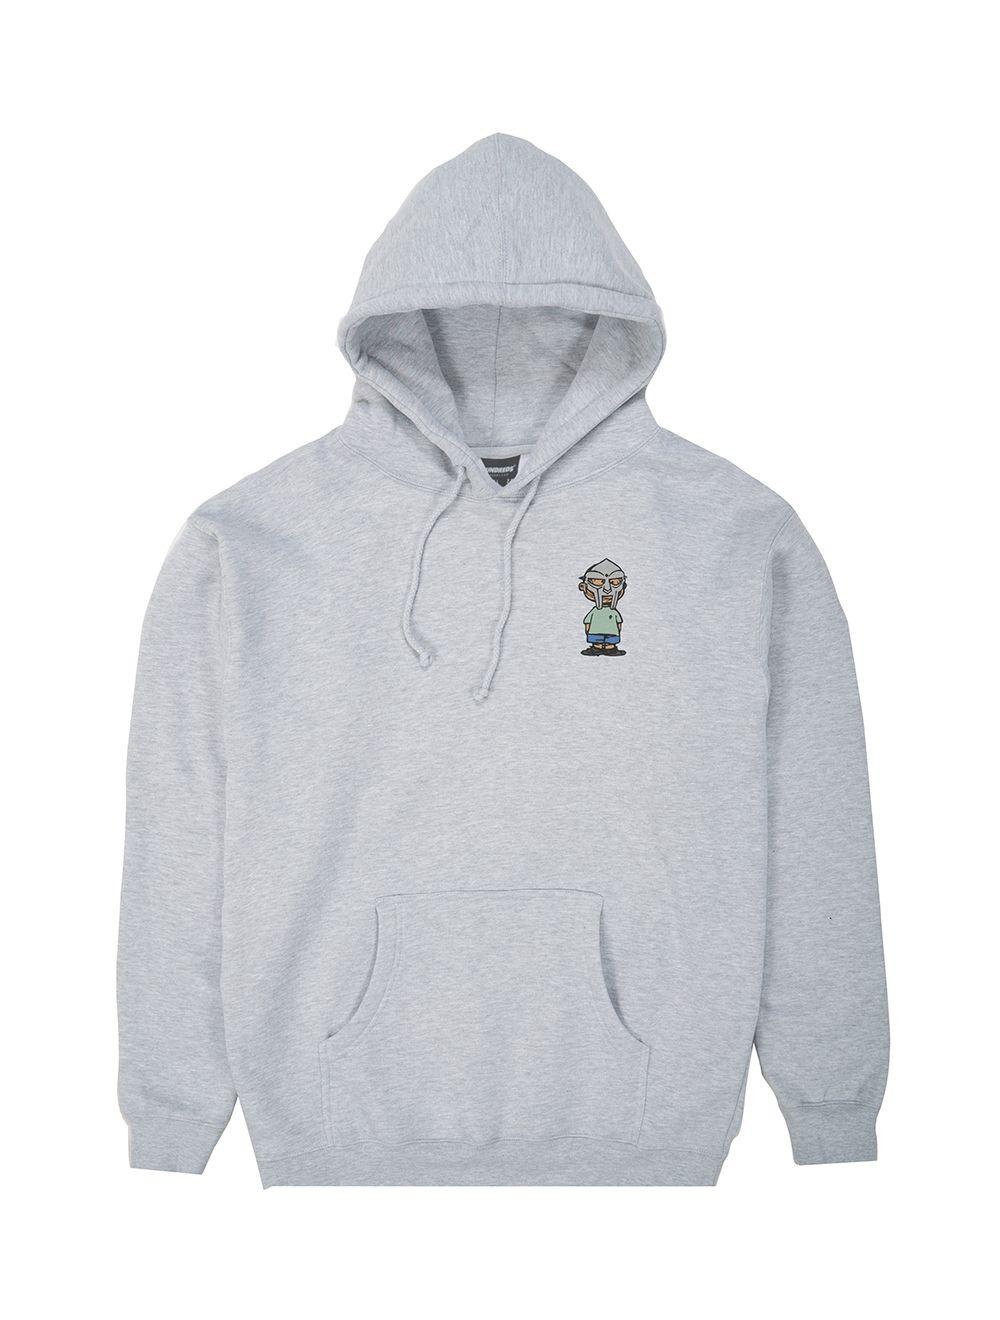 Mf Doom Sweatshirt Supreme Hip Hop Streetwear Pullover